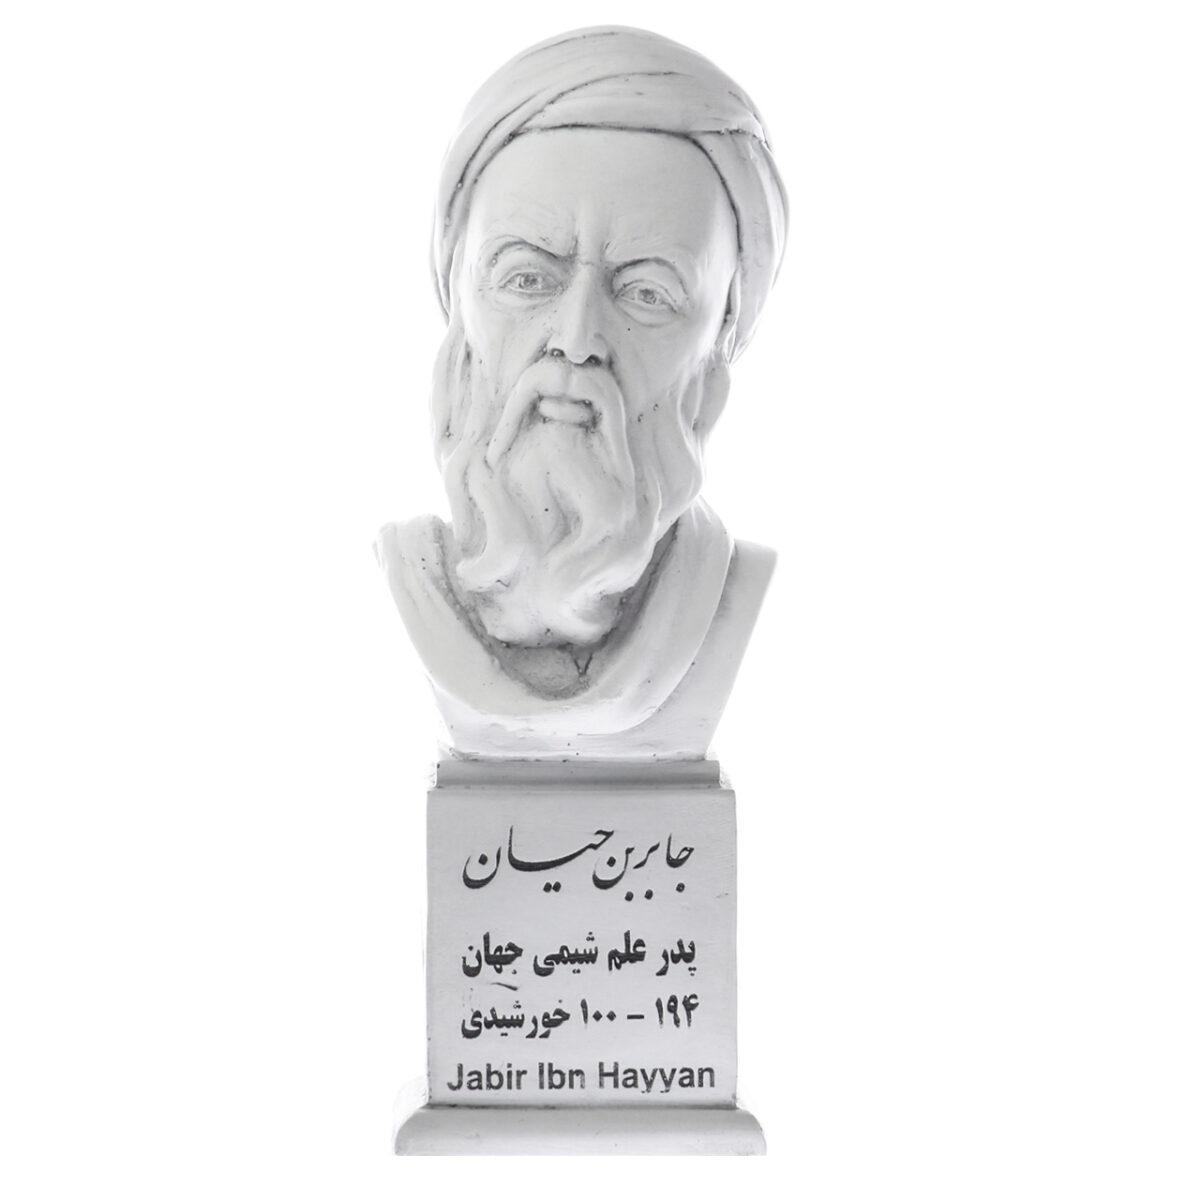 jaberebn hayyan s 1200x1200 - سردیس جابر ابن حیان